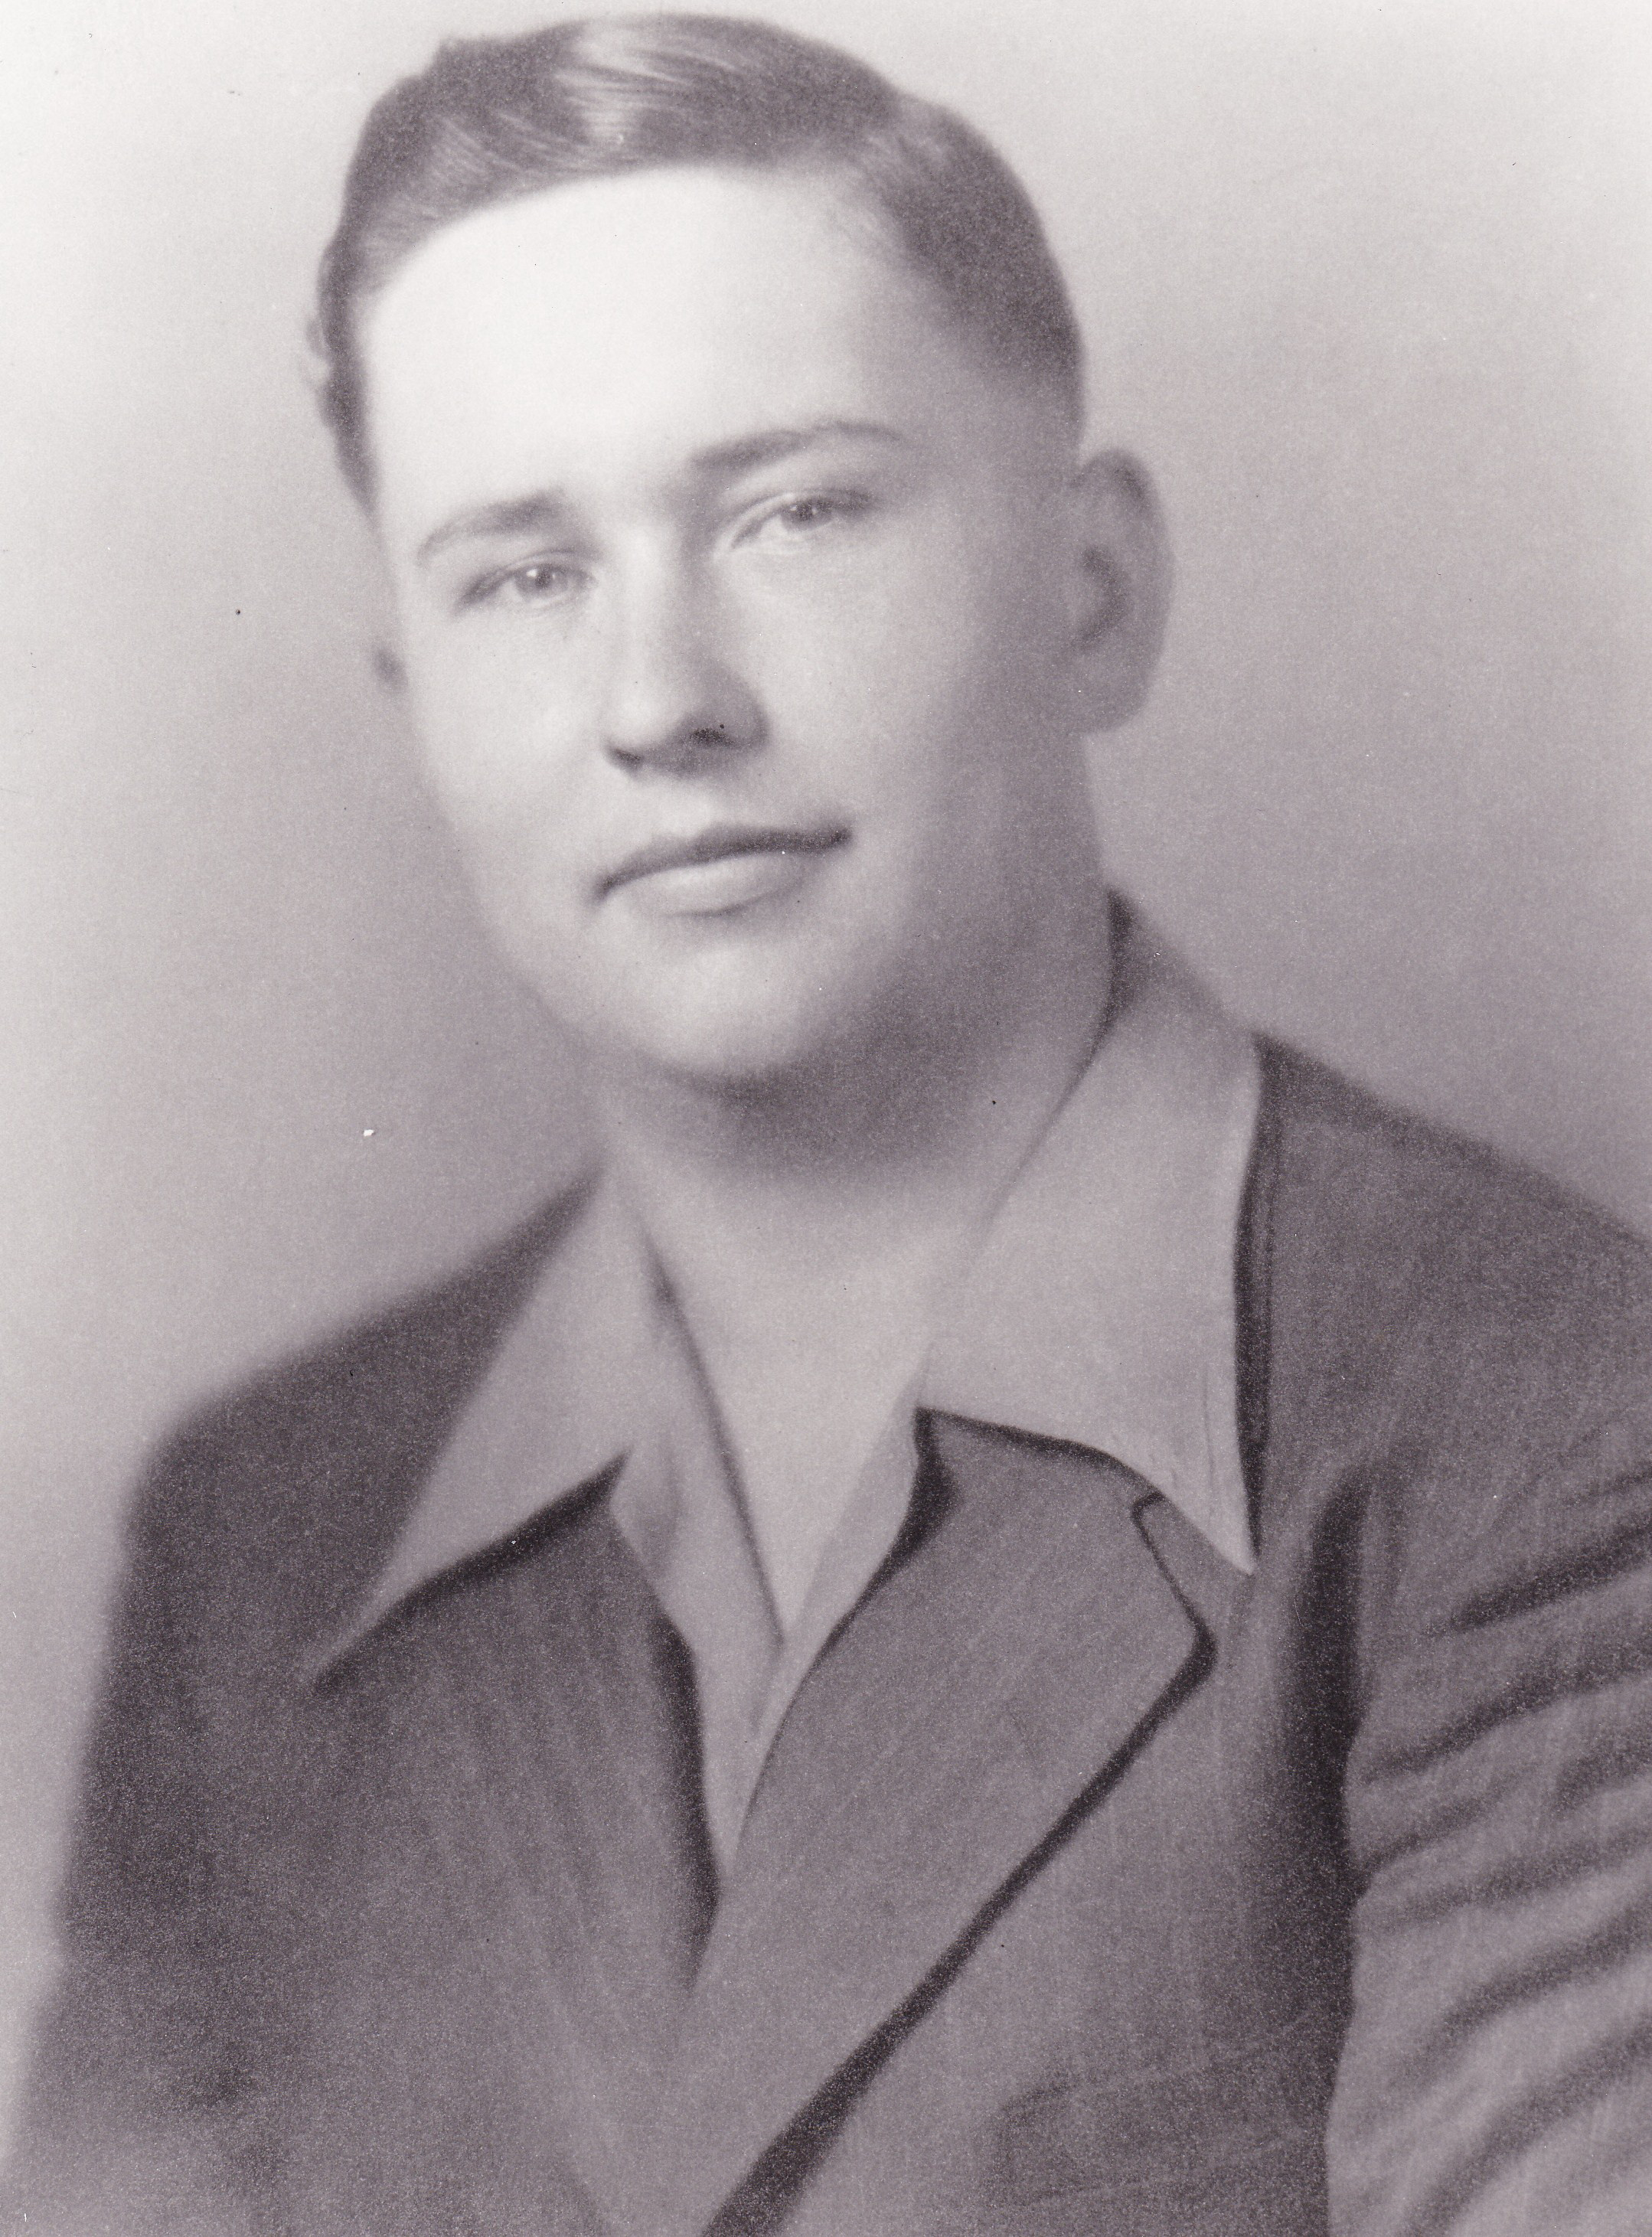 Friedrich Wilhelm Zucknick